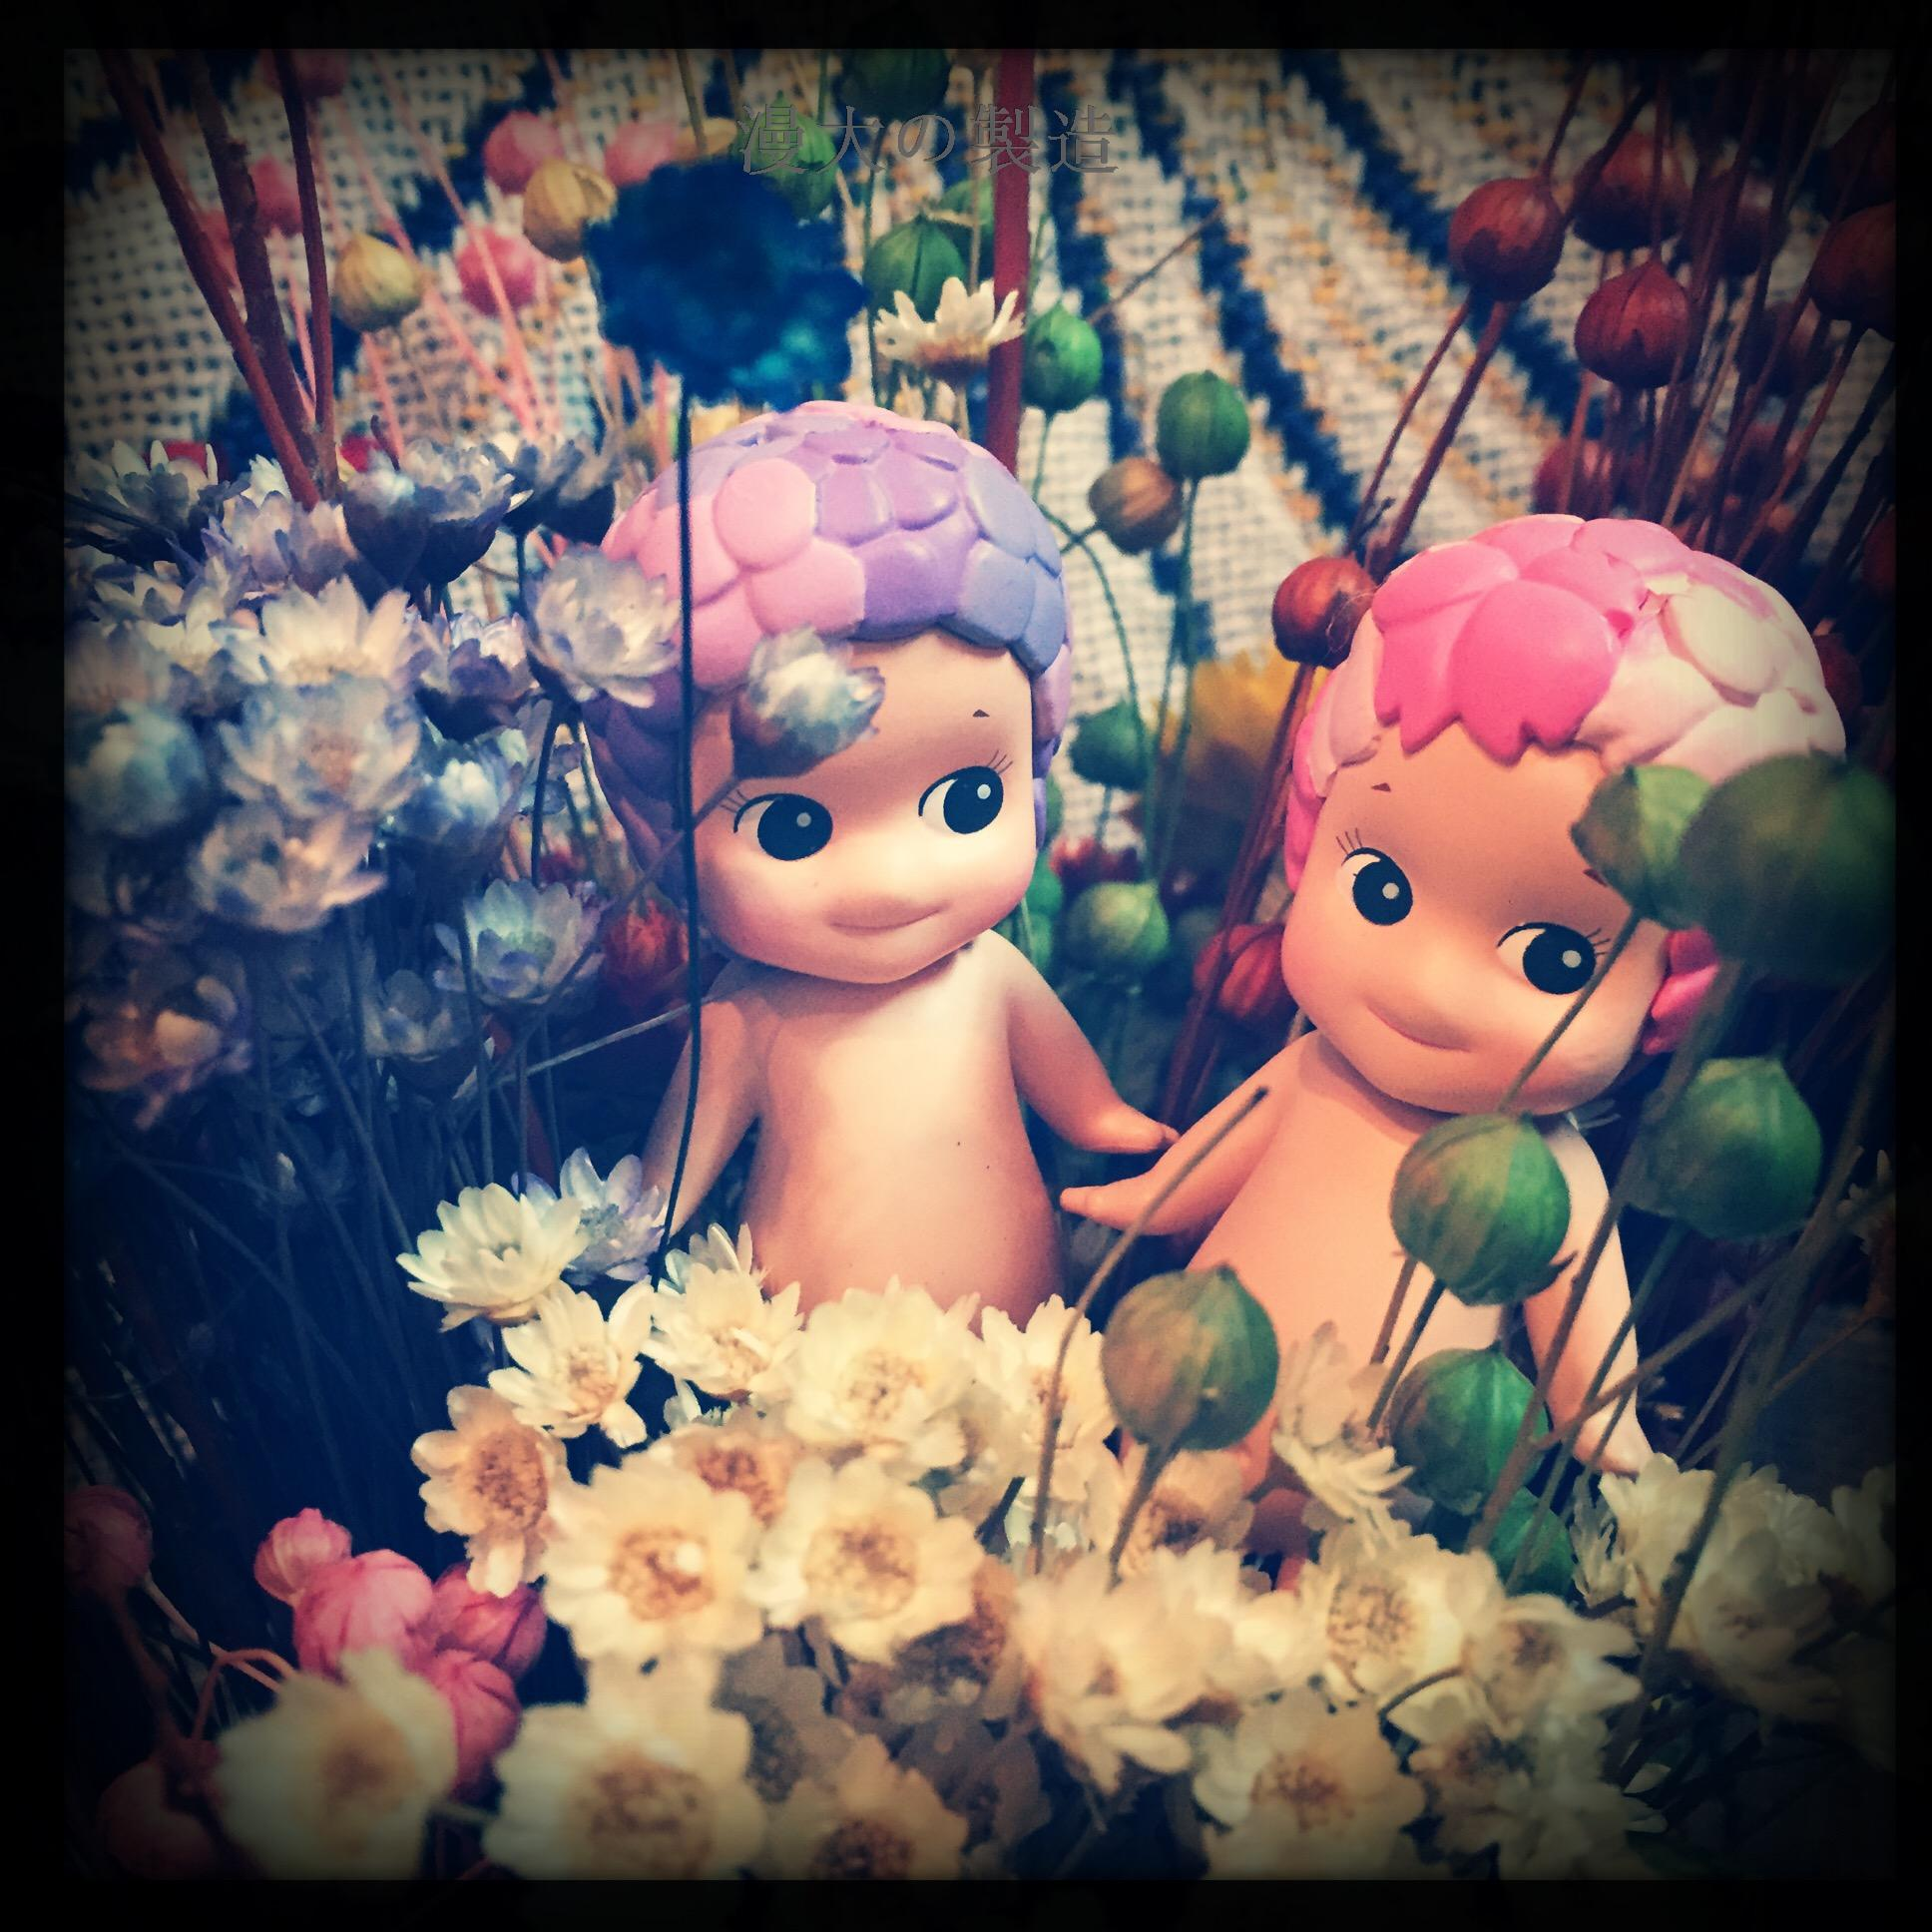 Куклы/ украшения/детали Sonny angel sonny angel 6pcs set mini christmas series sonny angel dolls pvc action figure collectible model toy 8cm kt2530